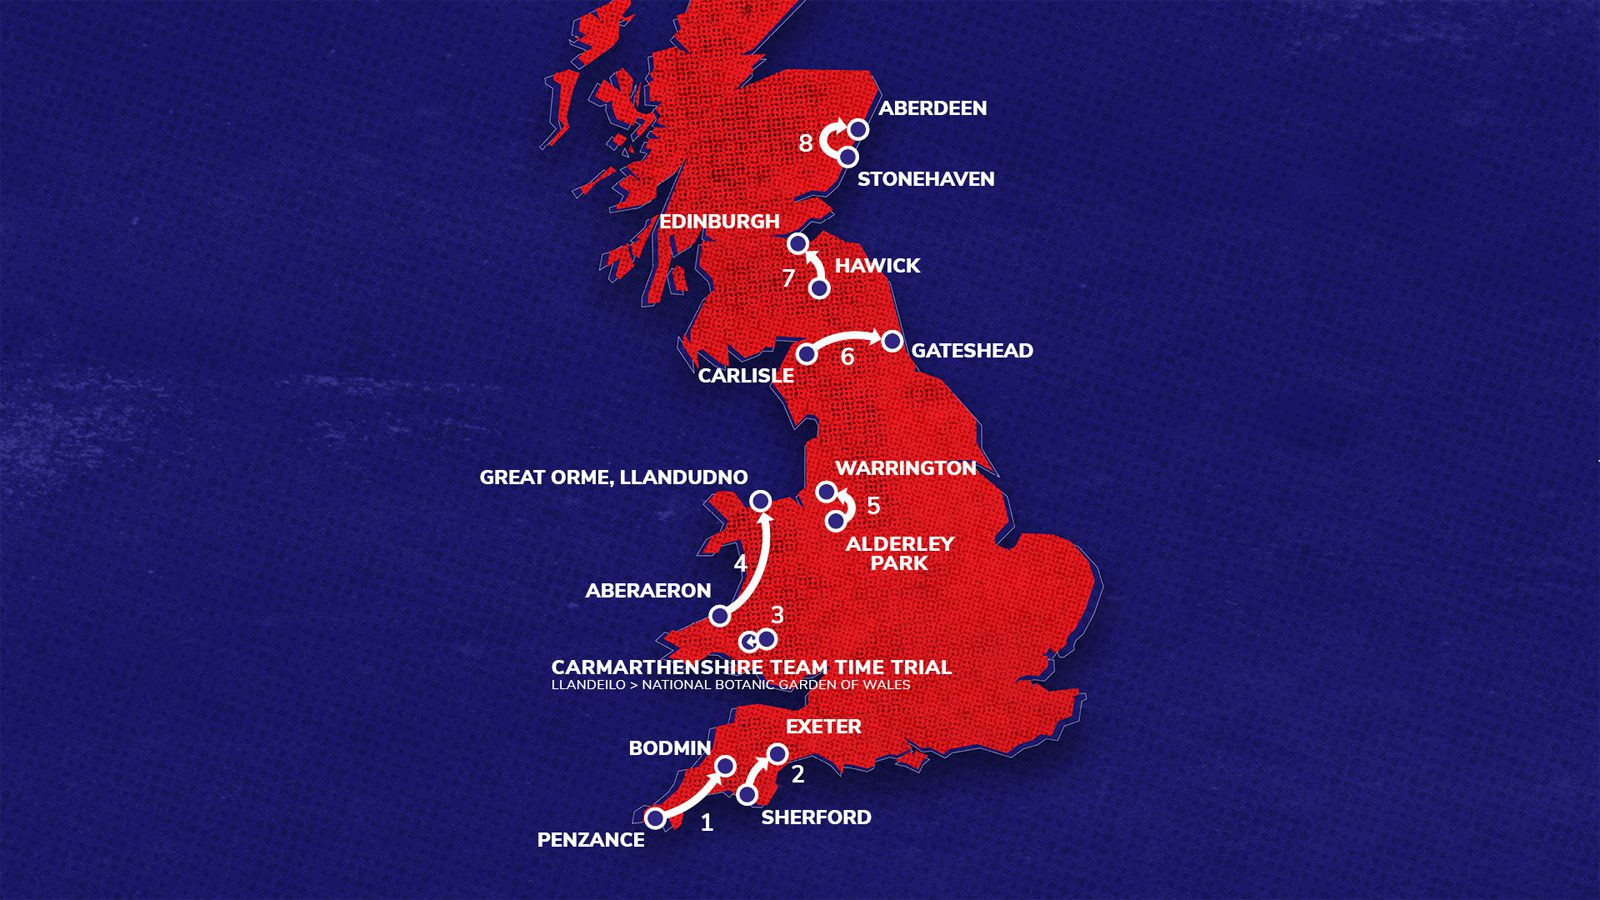 Tour of Britain 2021 map